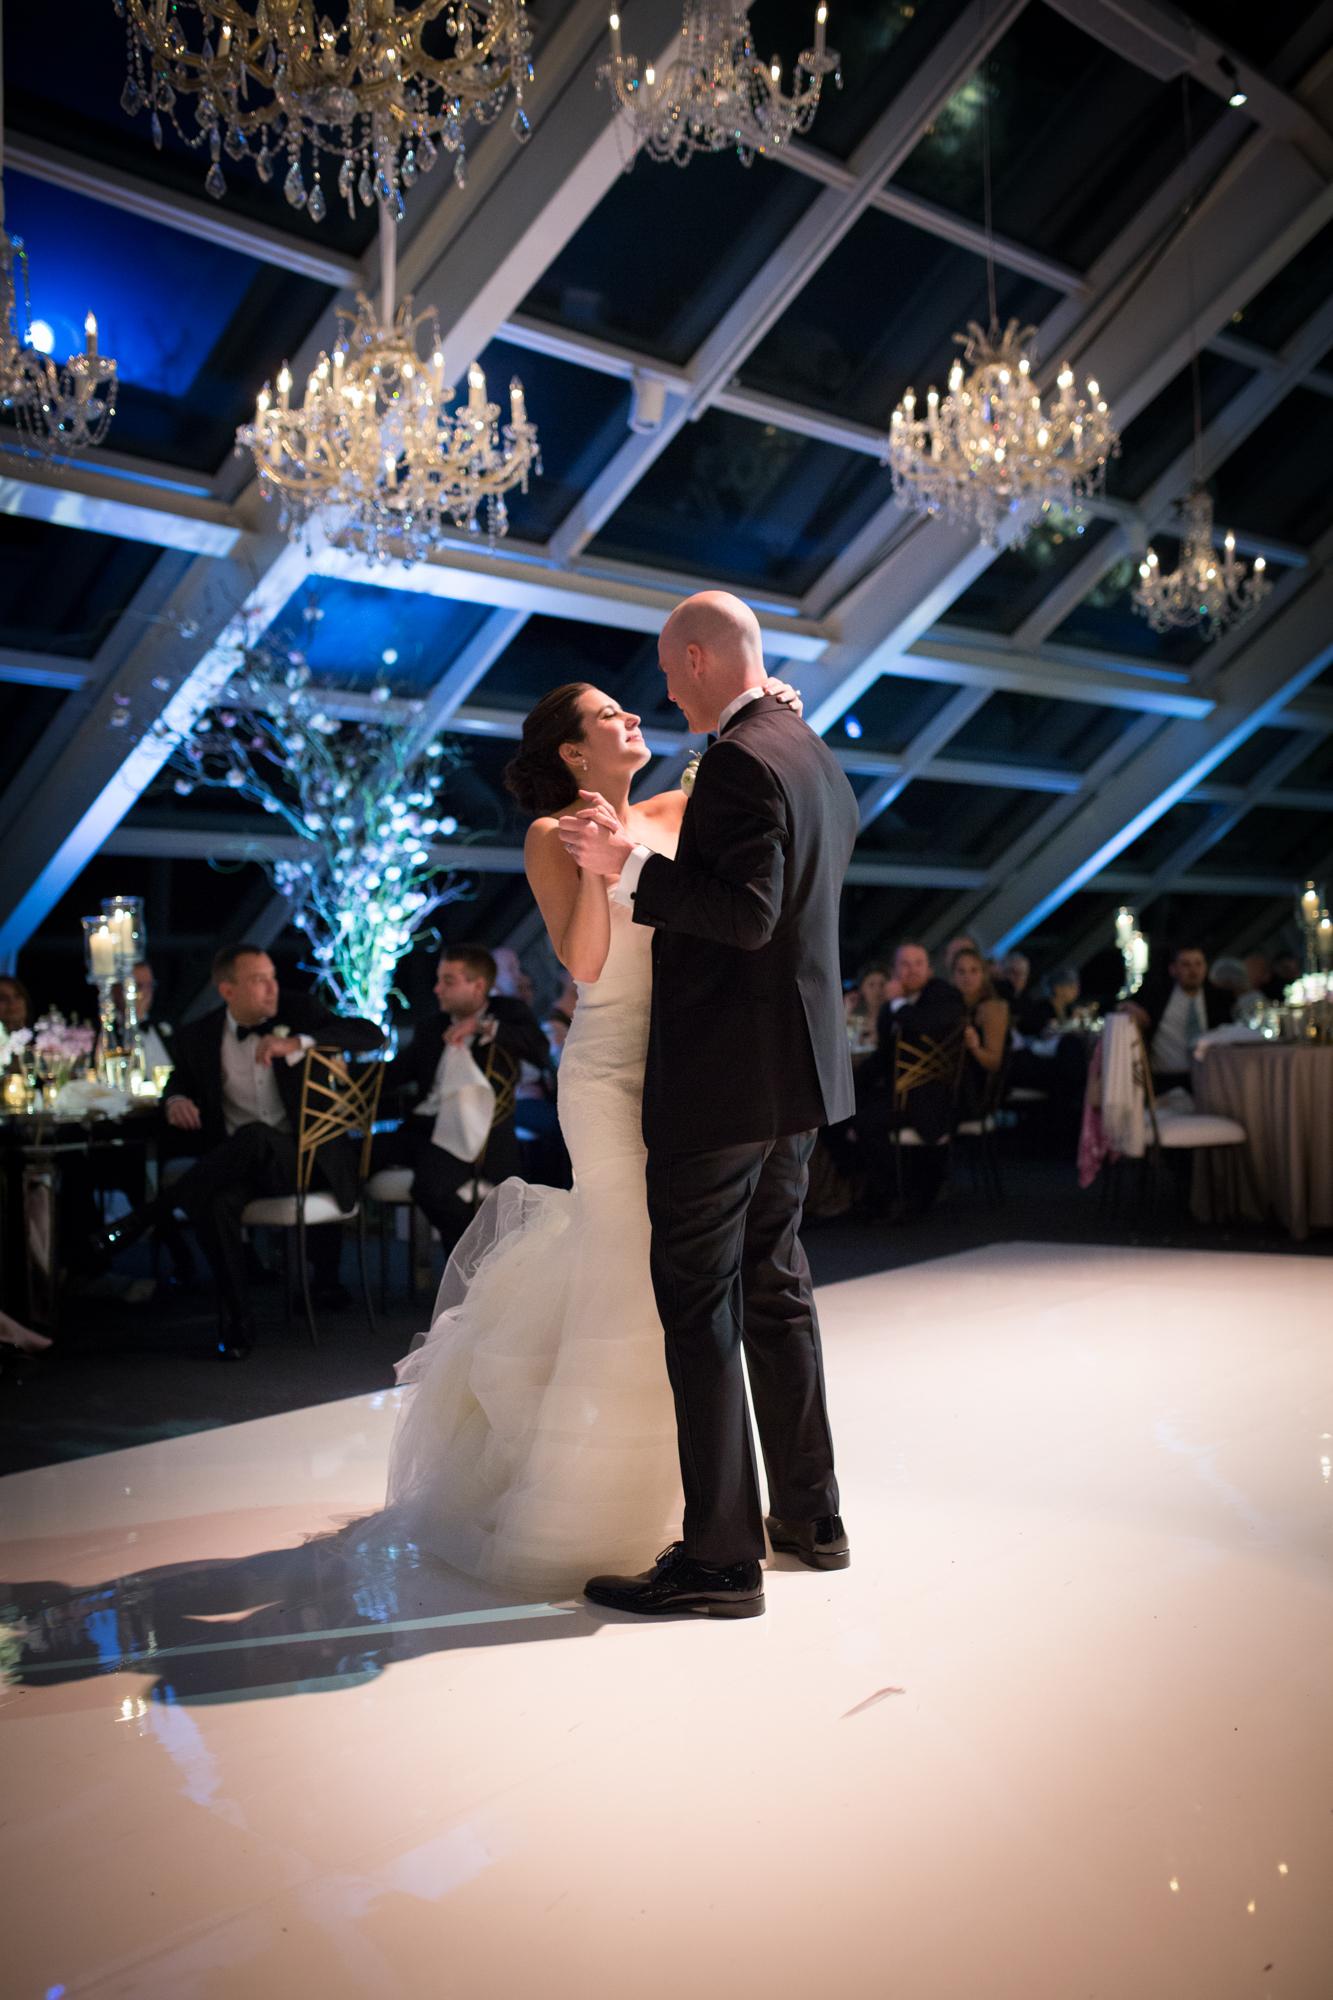 Bride and groom's first dance at Adler Planetarium wedding.